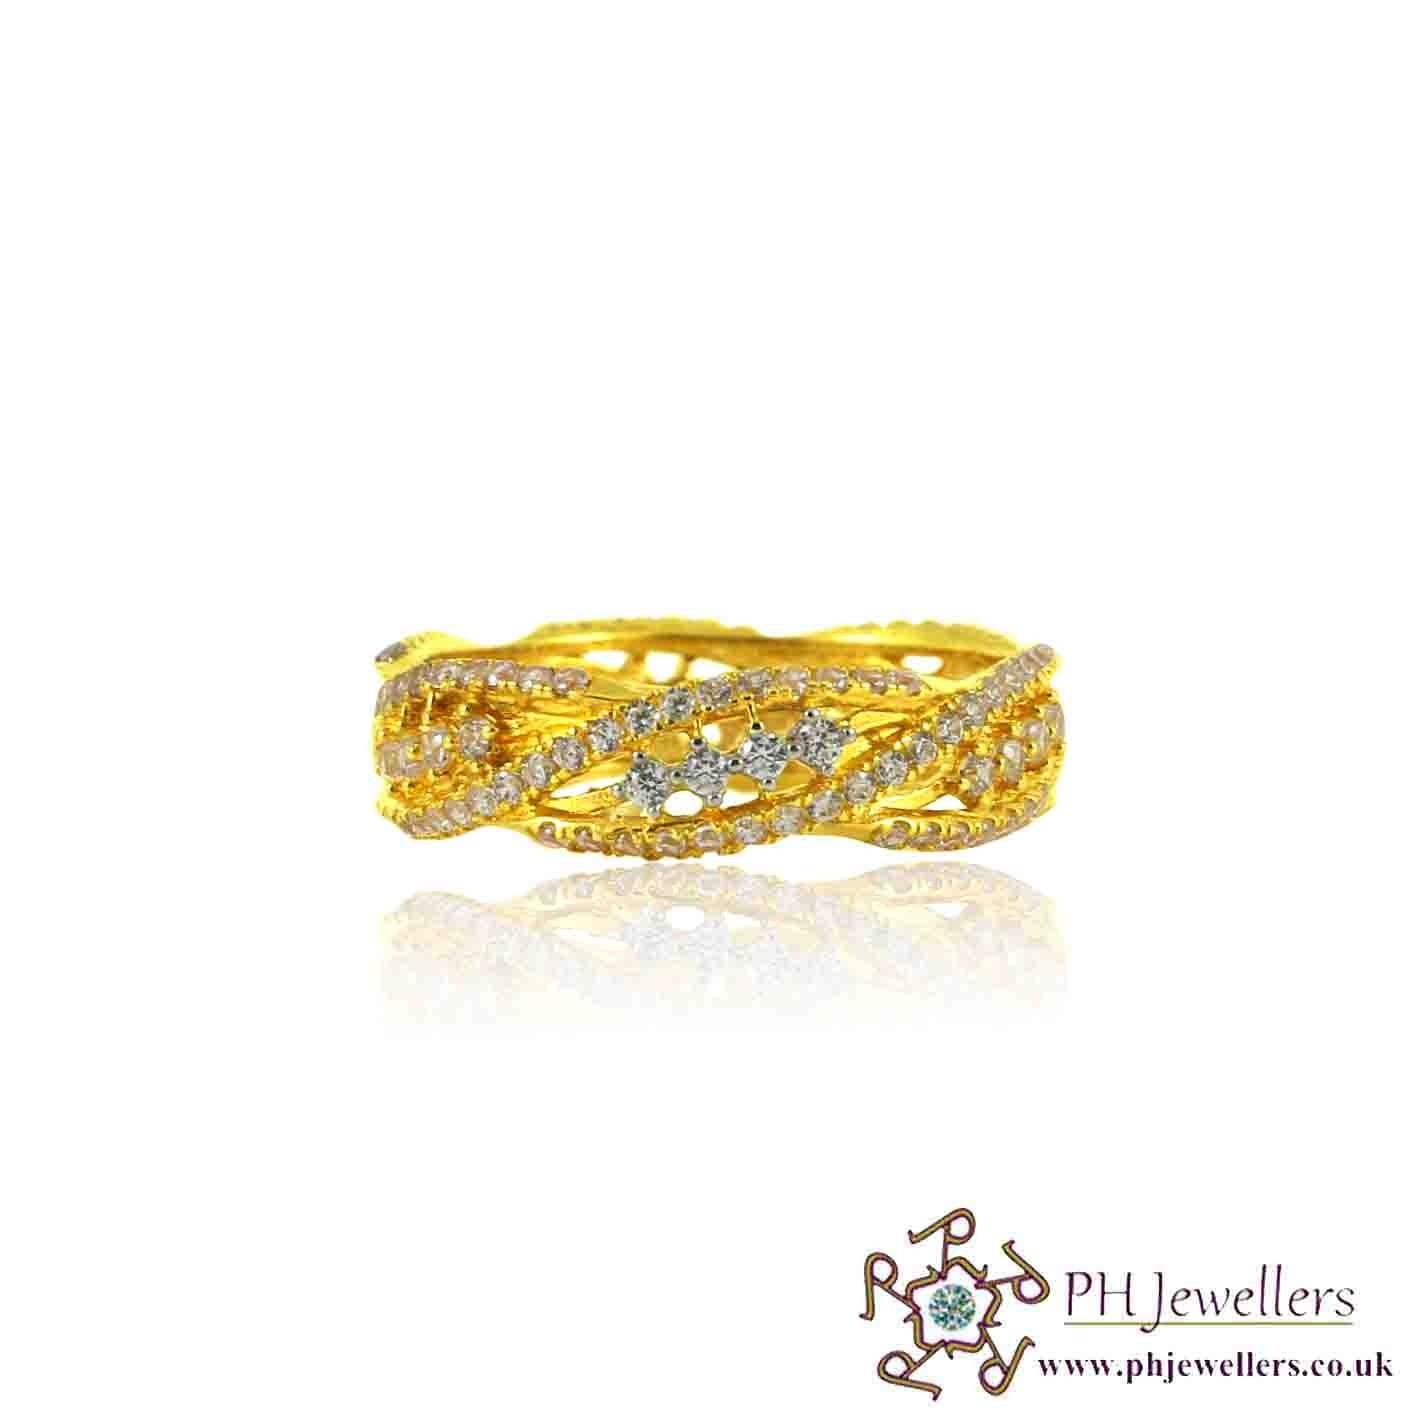 Online Gold Jewellery Gold Jewellery 22ct 916 Yellow Gold Hallmark